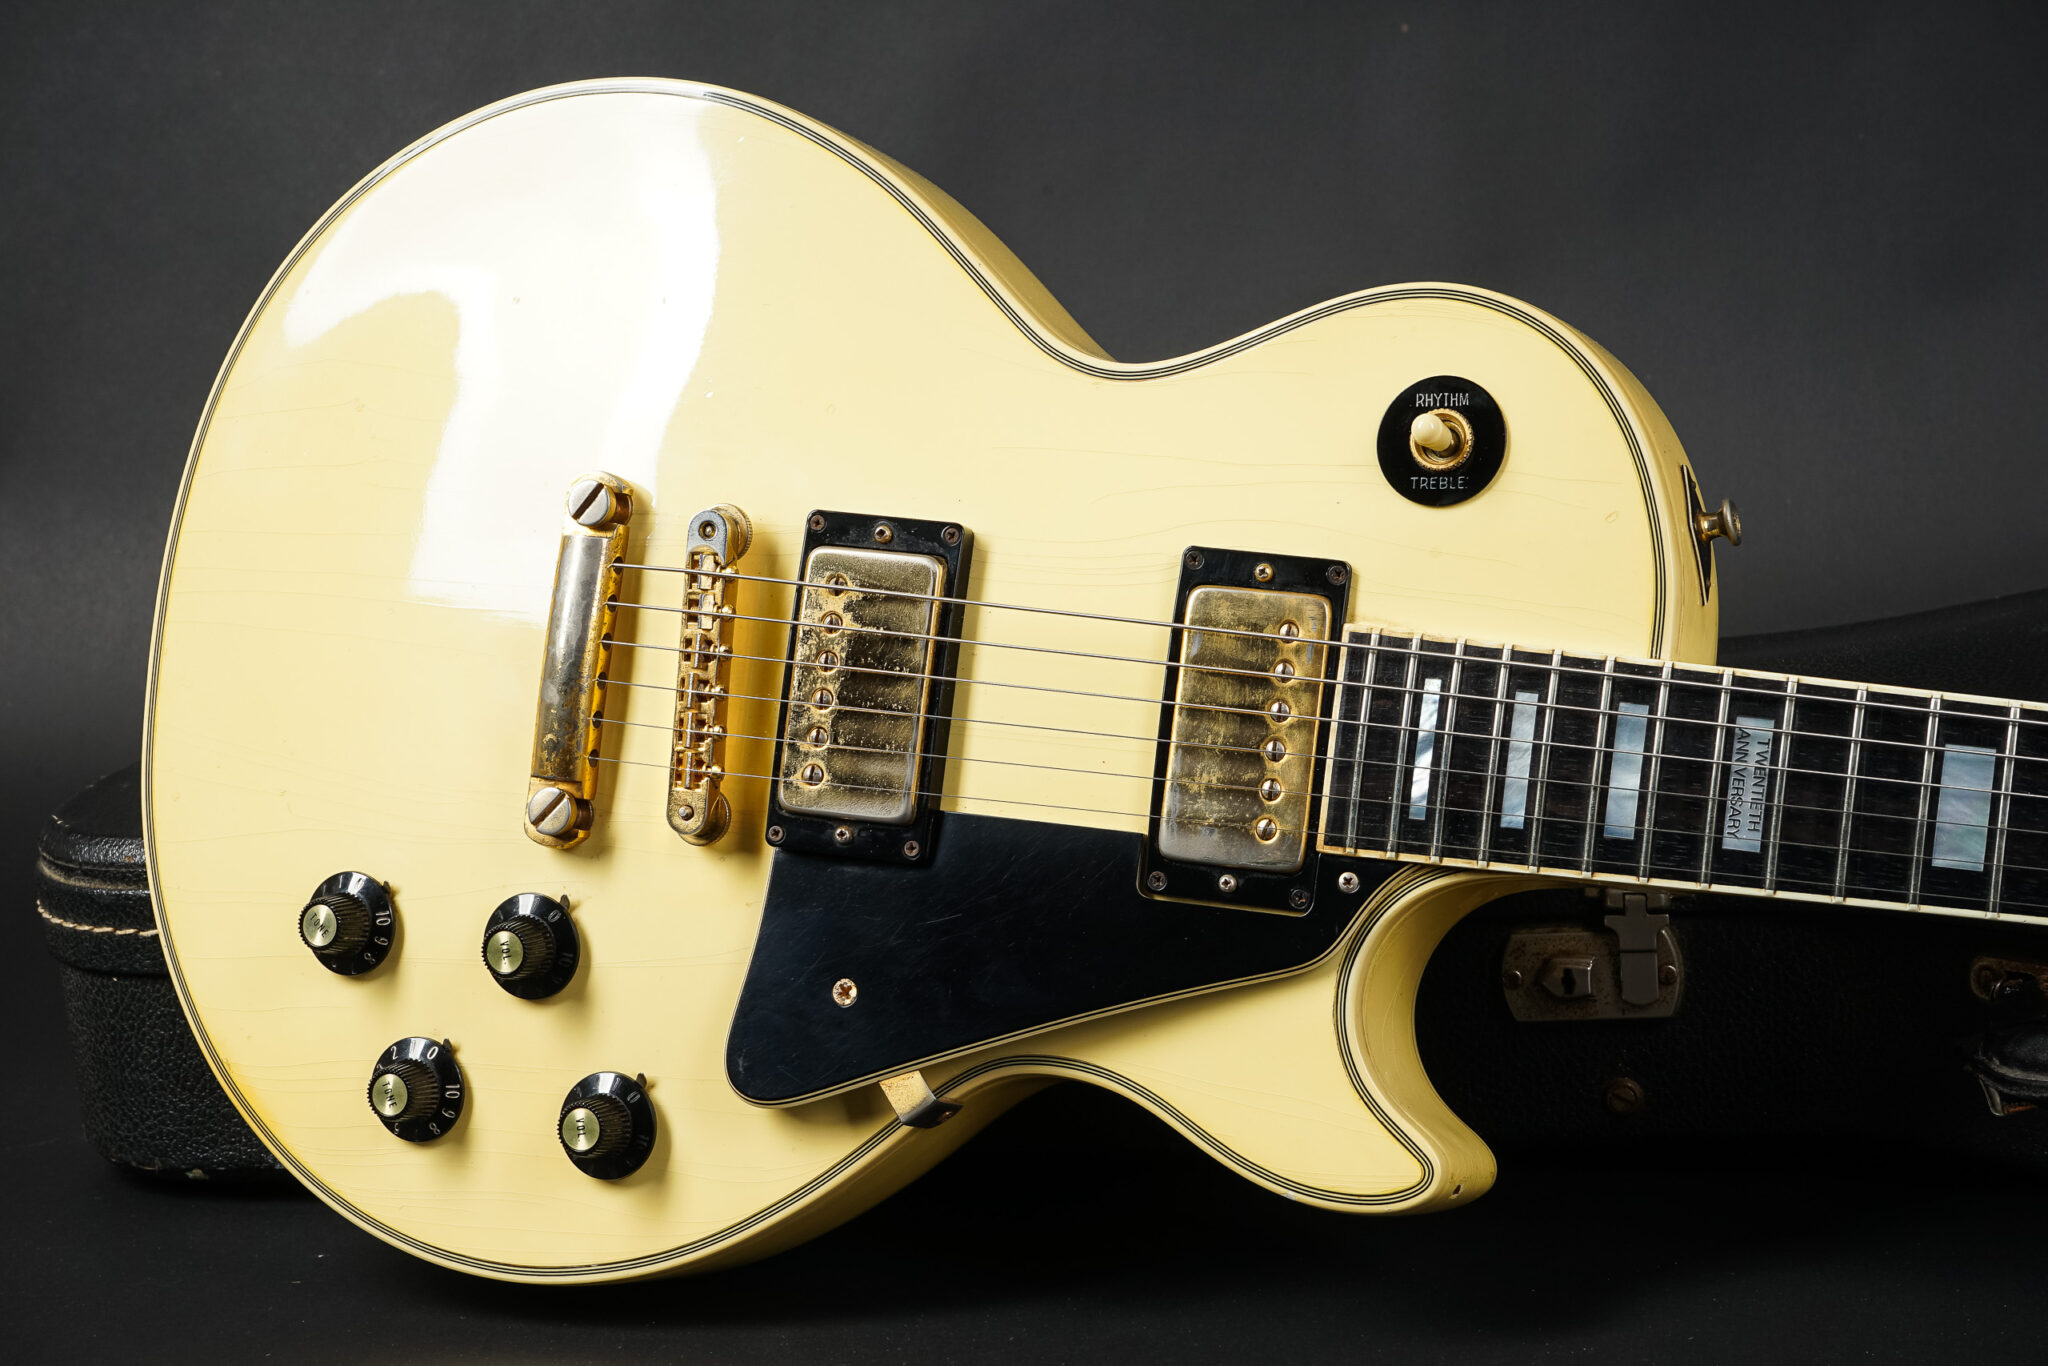 https://guitarpoint.de/app/uploads/products/1974-gibson-les-paul-custom-40th-anniversary-white/1974-Gibson-Les-Paul-Custom-White-508724-9-2048x1366.jpg